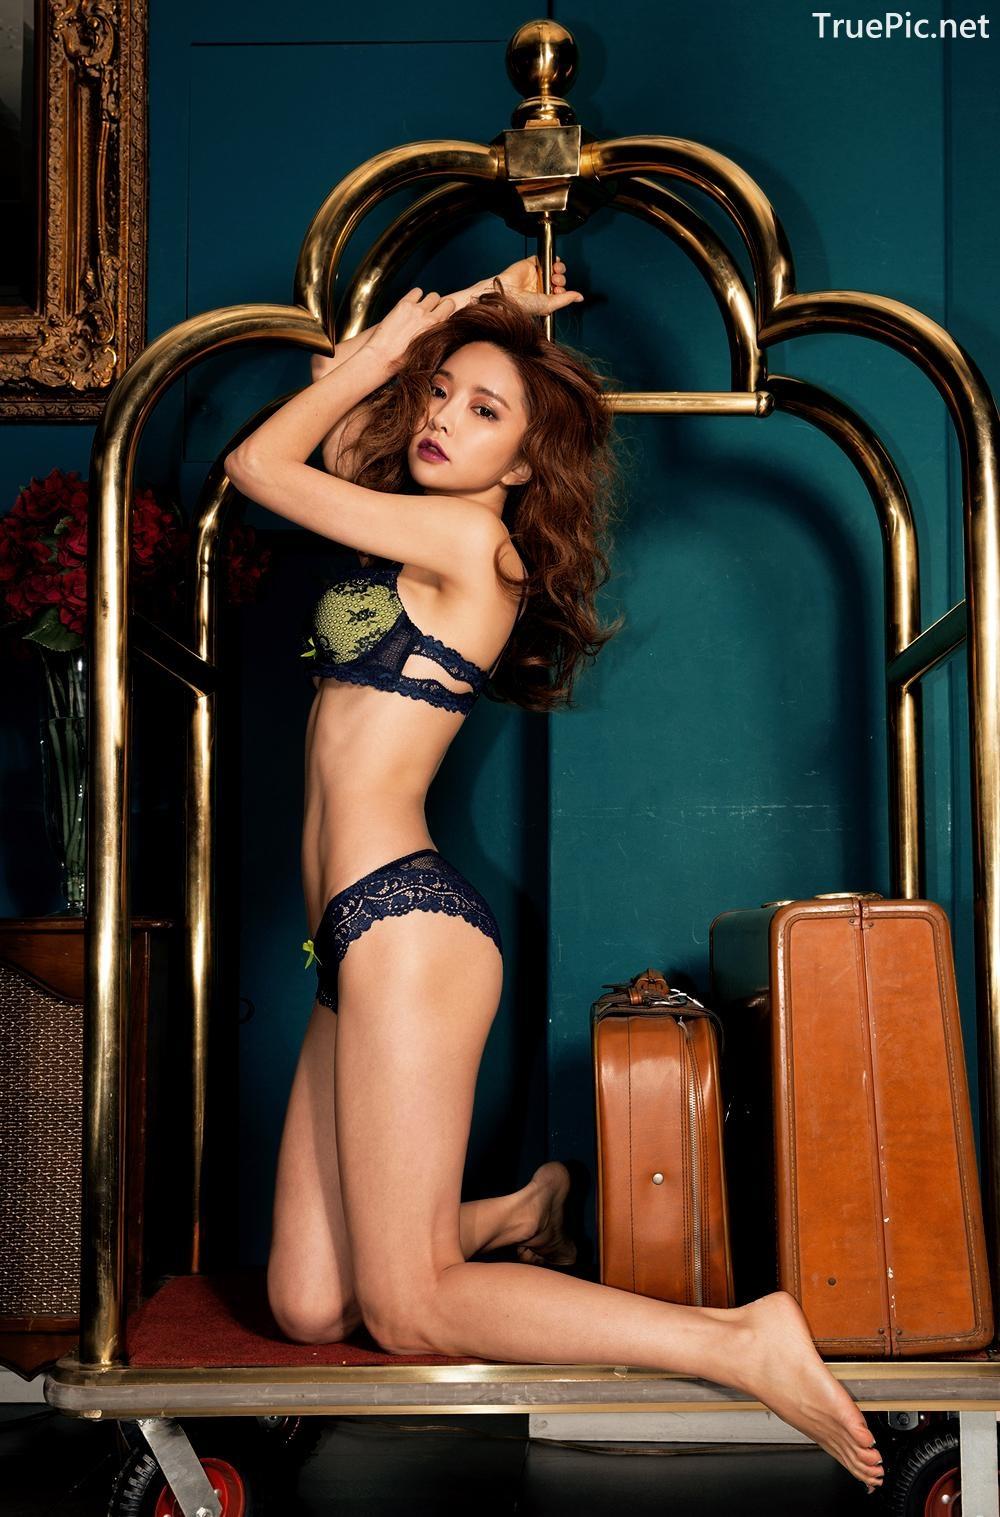 Image Korean Fashion Model - Park Soo Yeon - BVB Black Lace Lingerie - TruePic.net - Picture-9